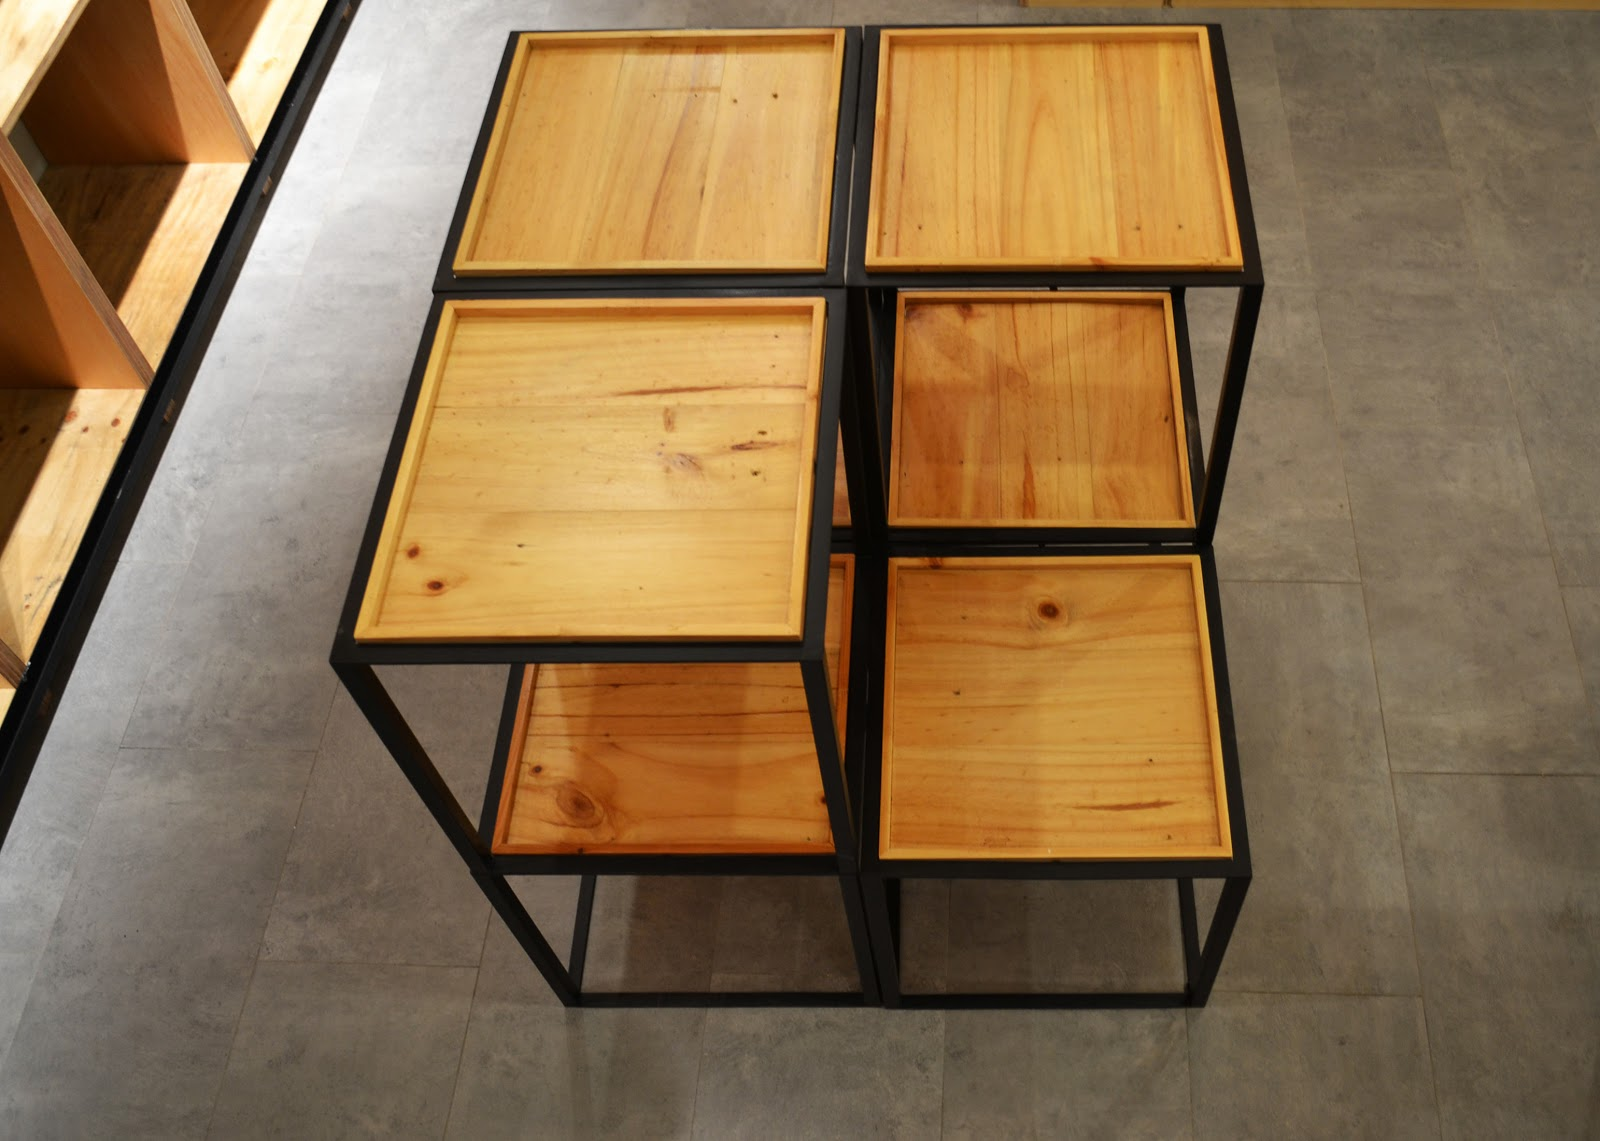 Recycle Pine Wood Furniture Tetawowe Atelier